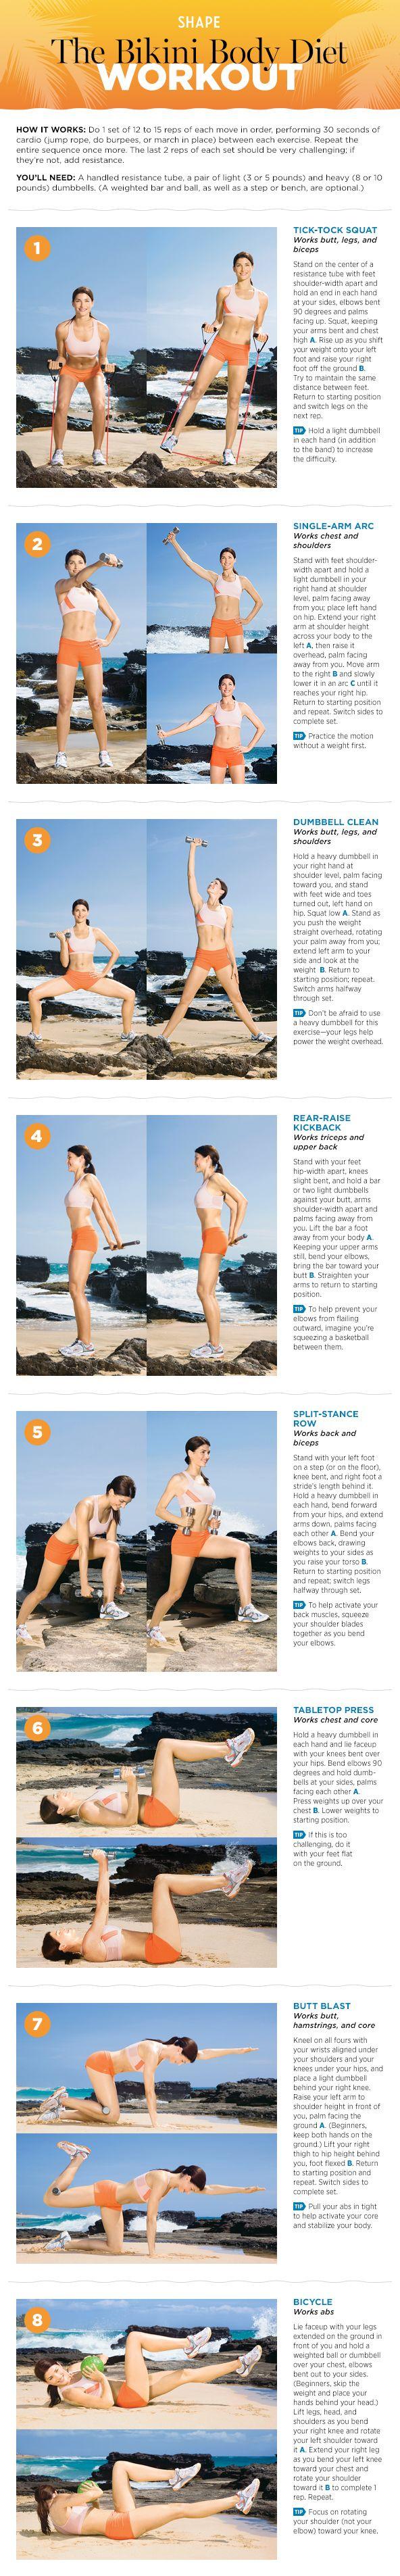 The Bikini Body Diet Workout to Lose Fat & Tone Up!-Shape Magazine